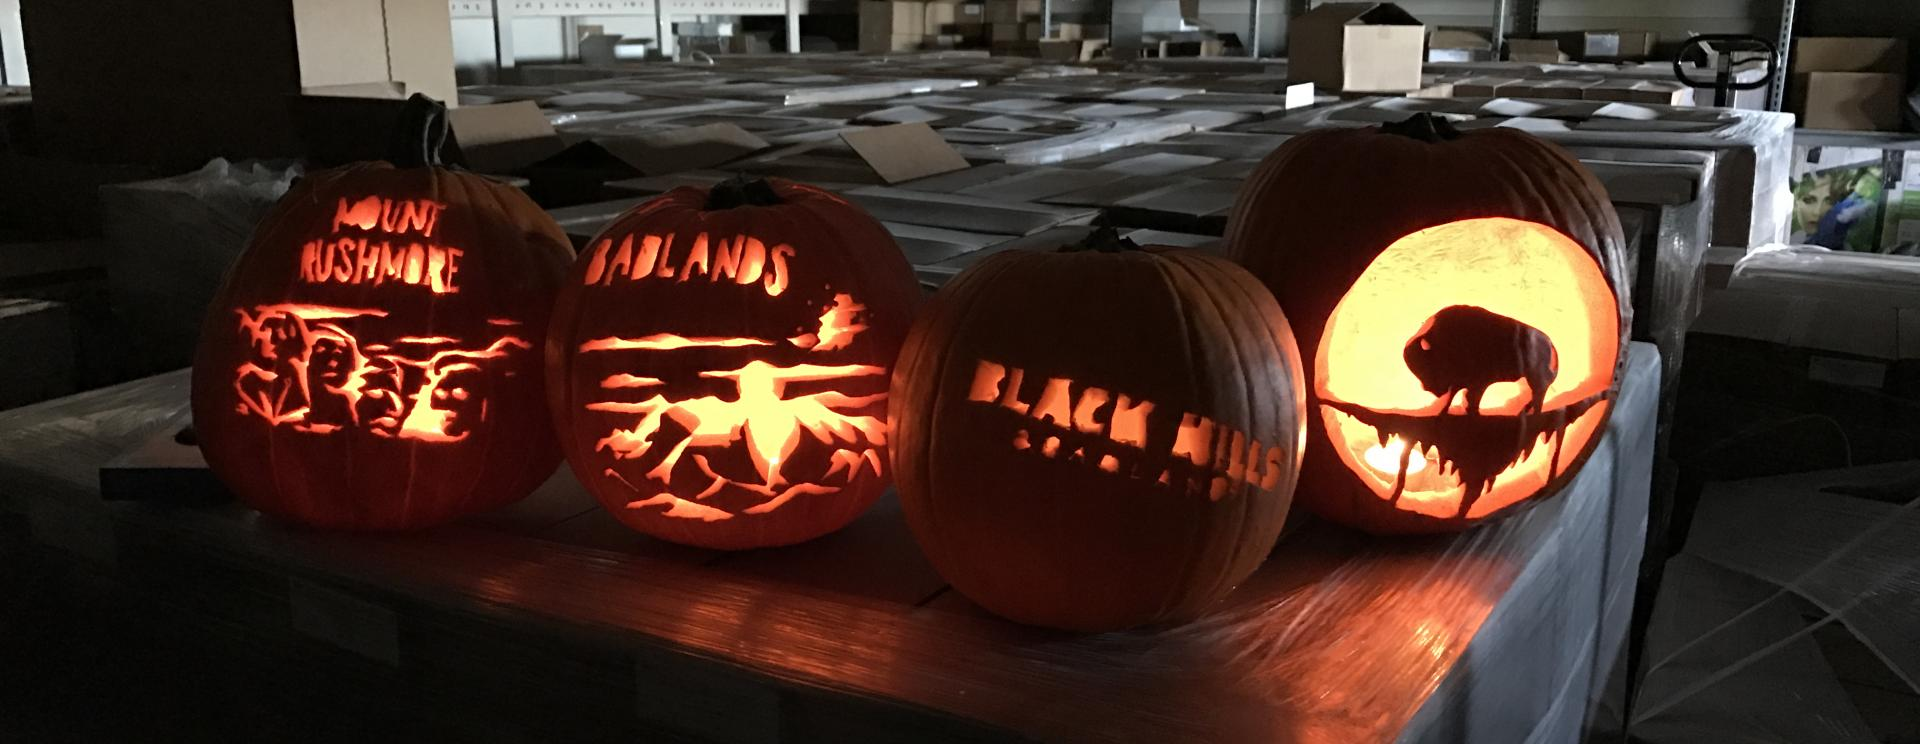 Black hills pumpkin carving designs black hills travel blog